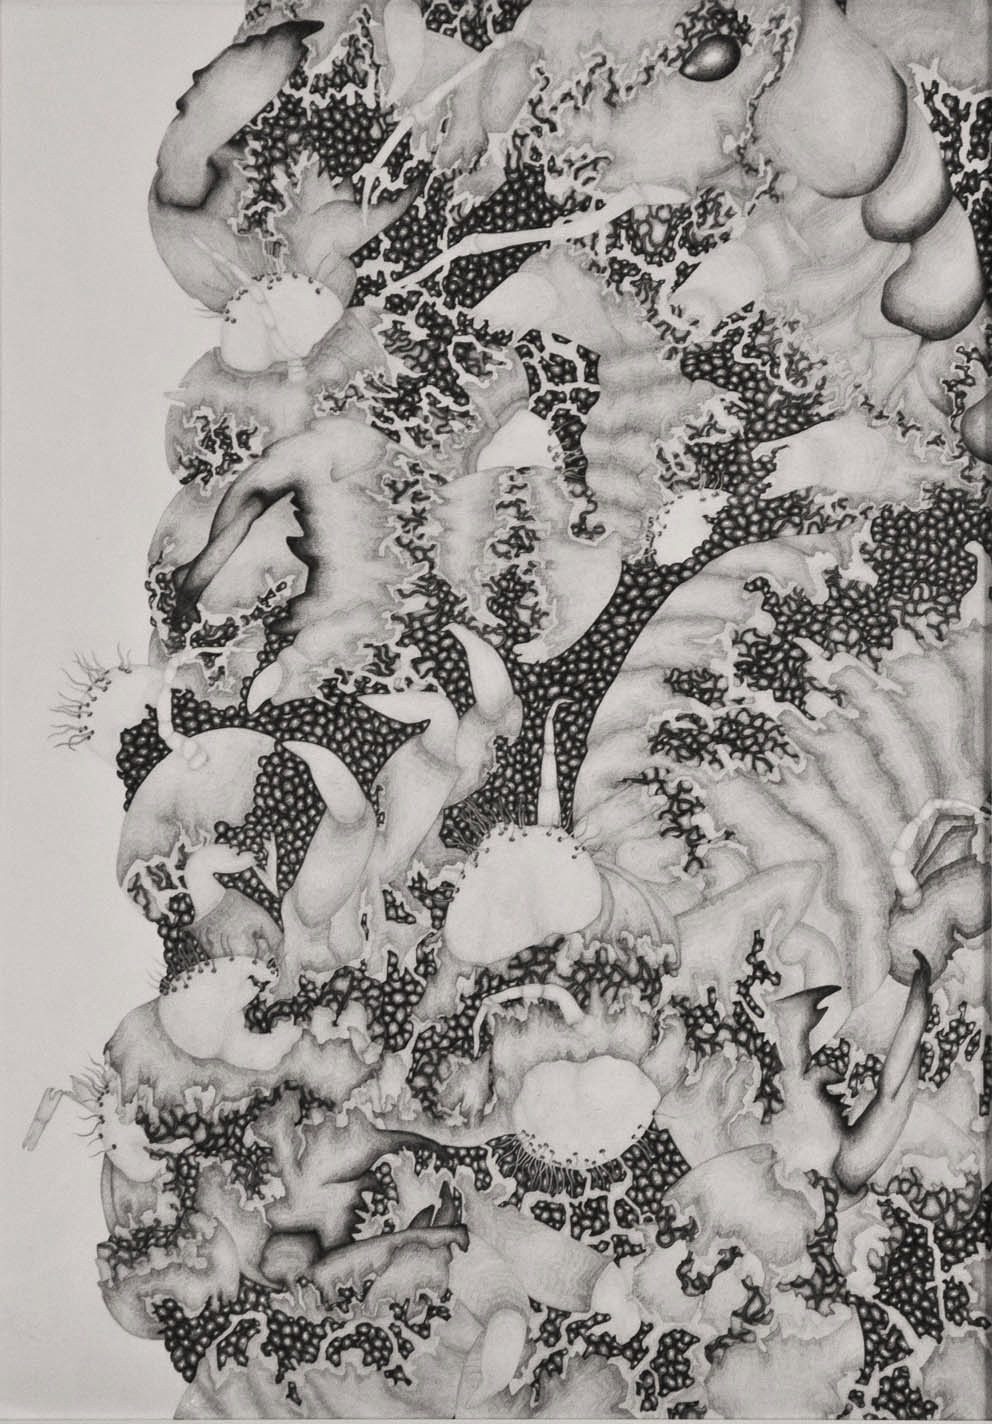 Entropy,  2013. 70cmx50cm. Pencil on Fabriano paper.